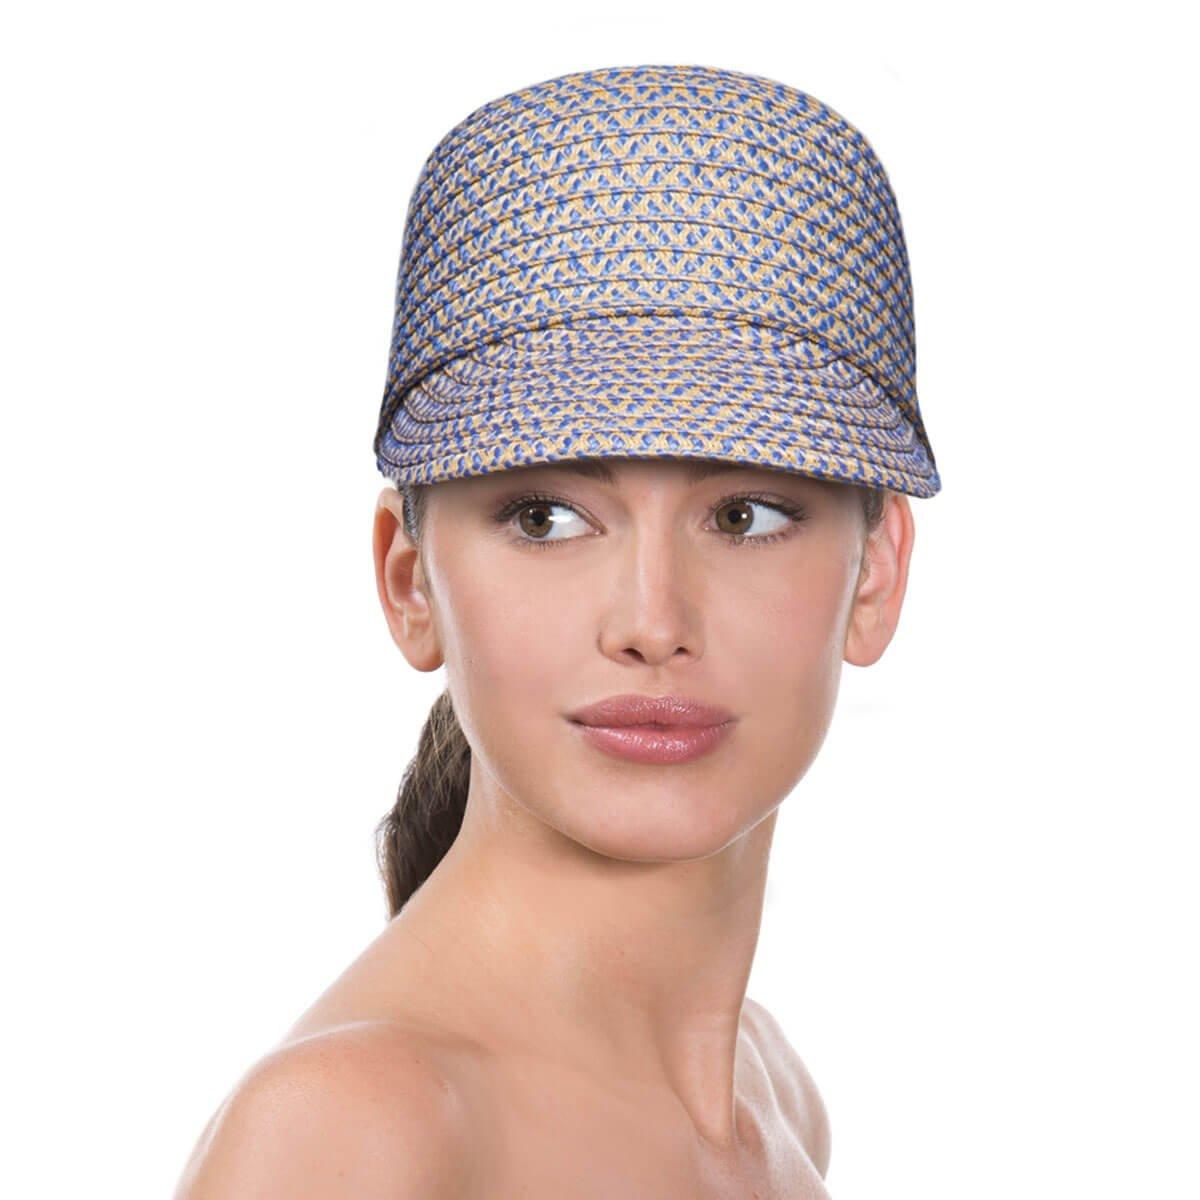 Eric Javits Luxury Fashion Designer Women's Headwear Hat - Mondo Cap (Blue Speckle, Medium/Large)